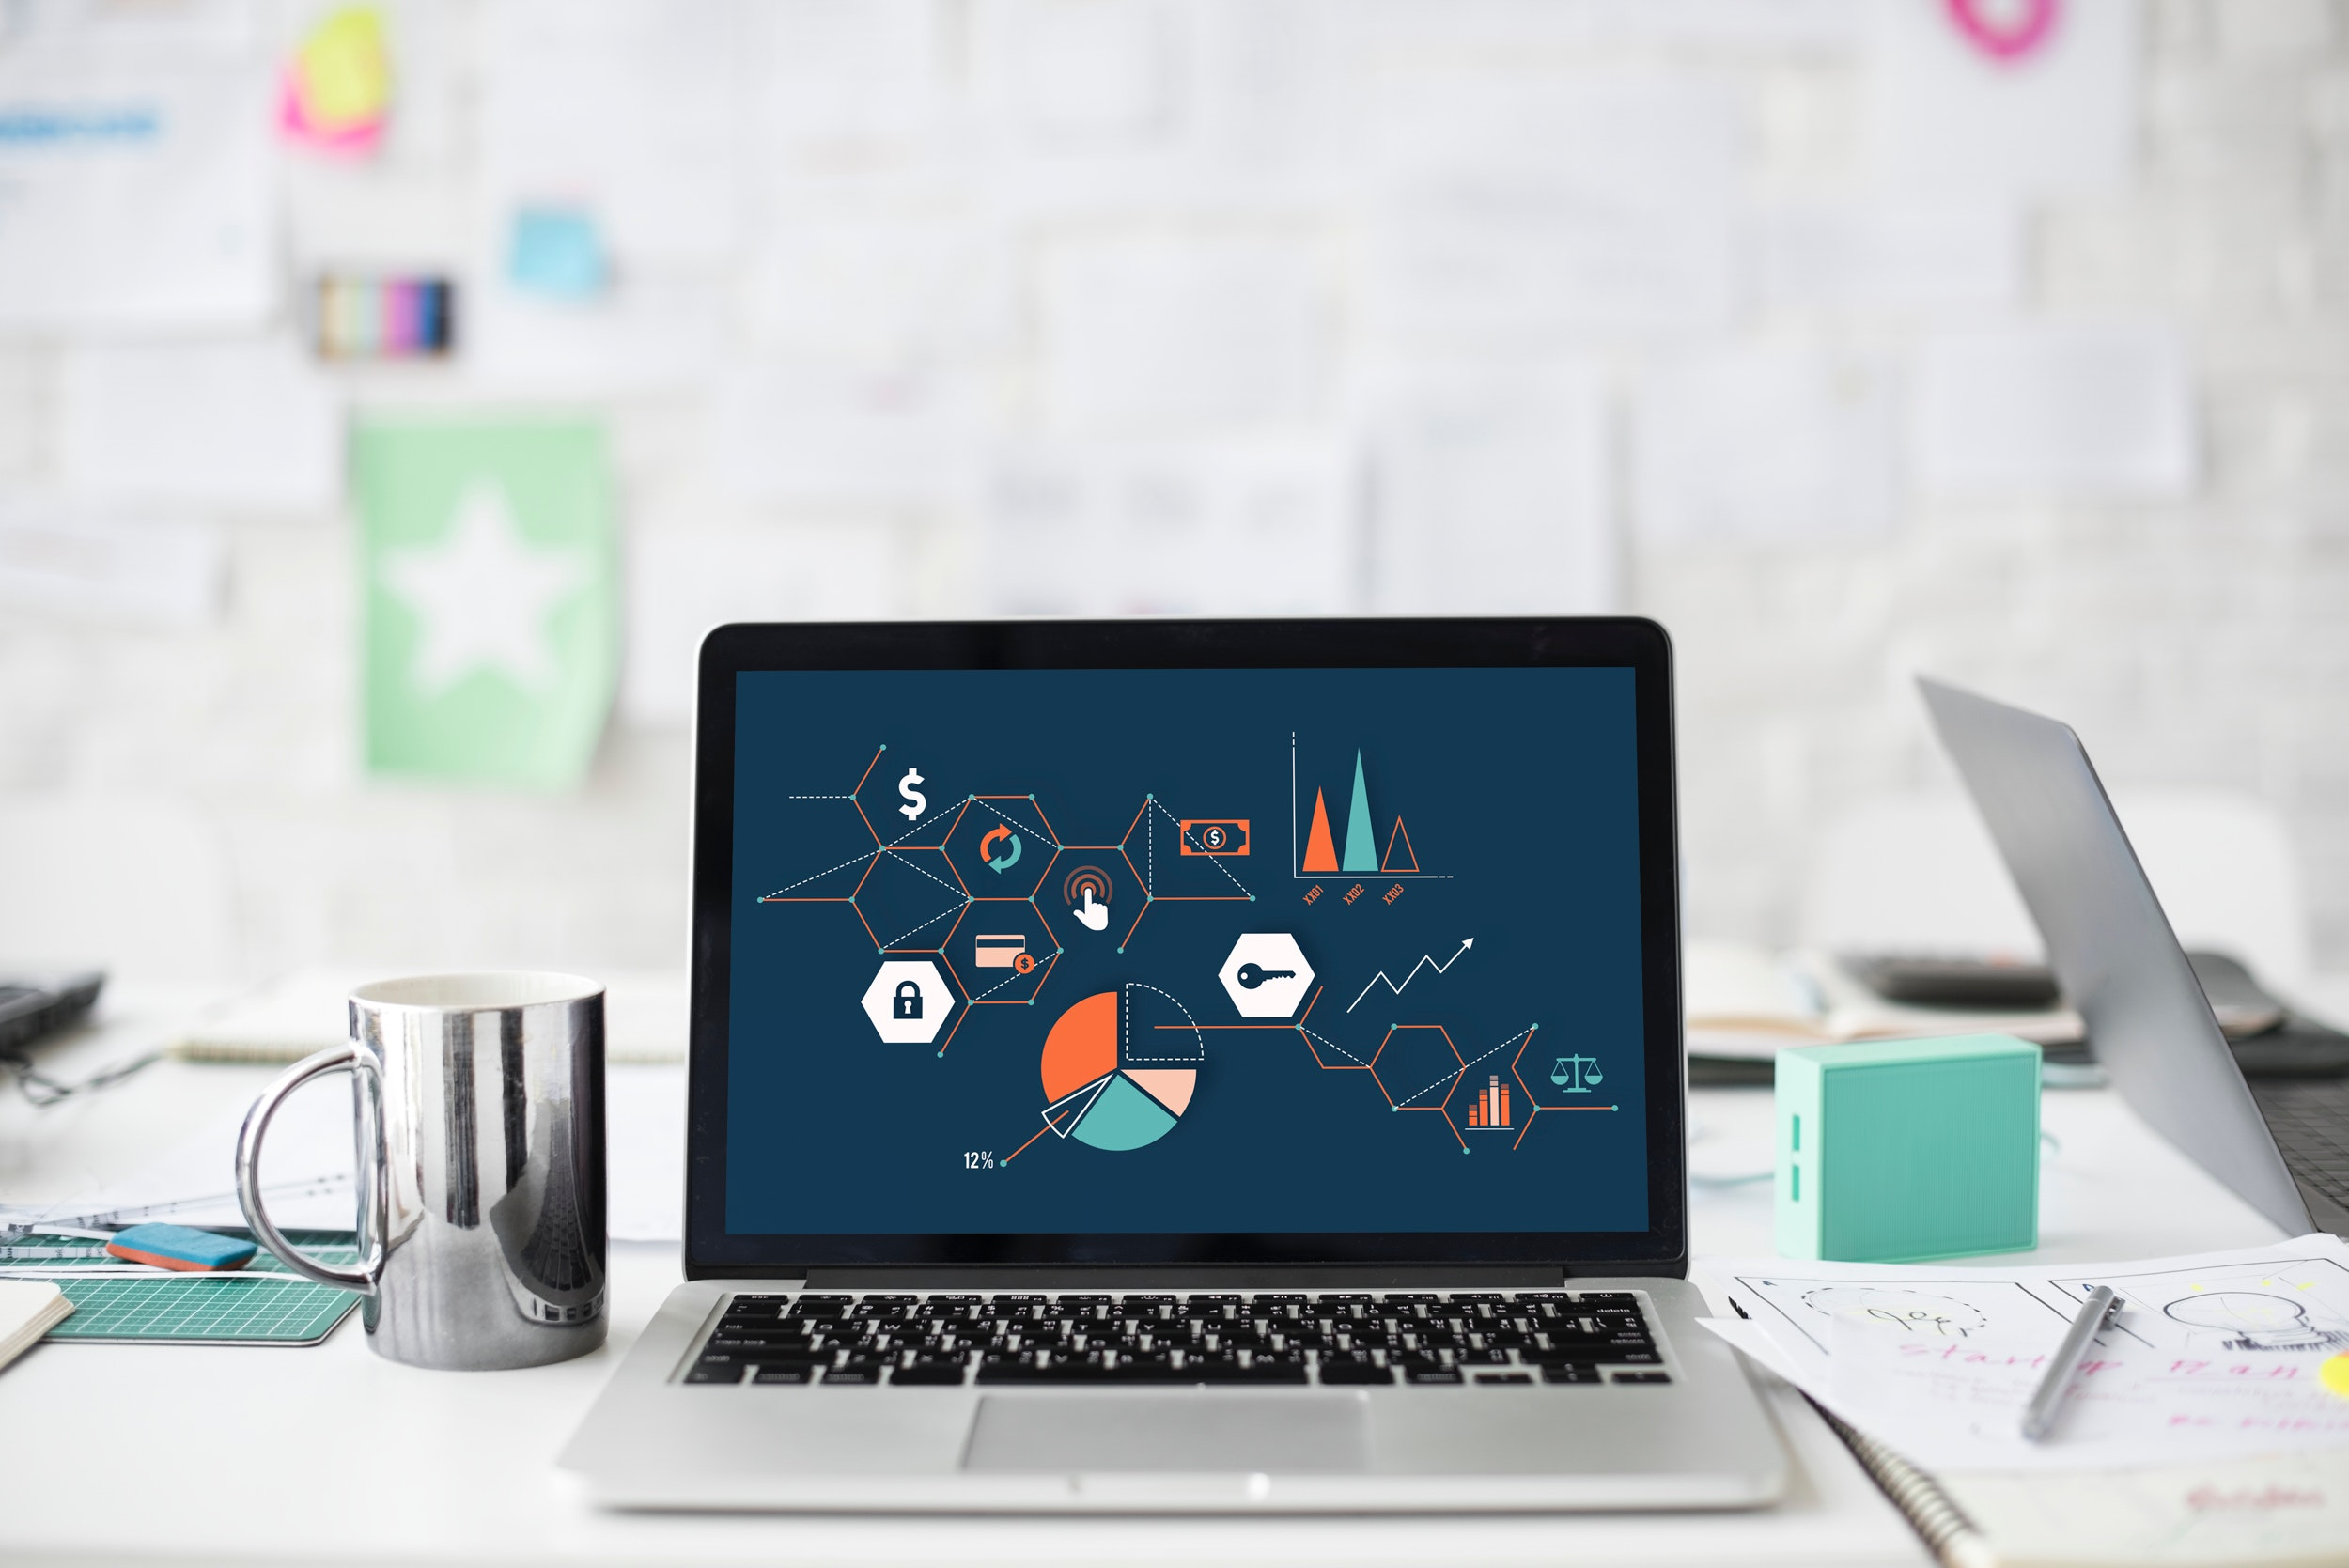 data analysis and survey development